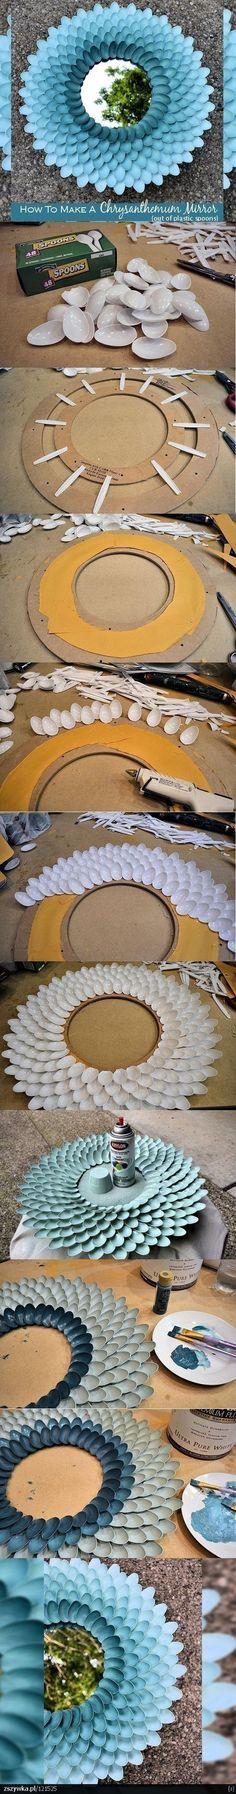 My next DIY project...Plastic spoon mirror